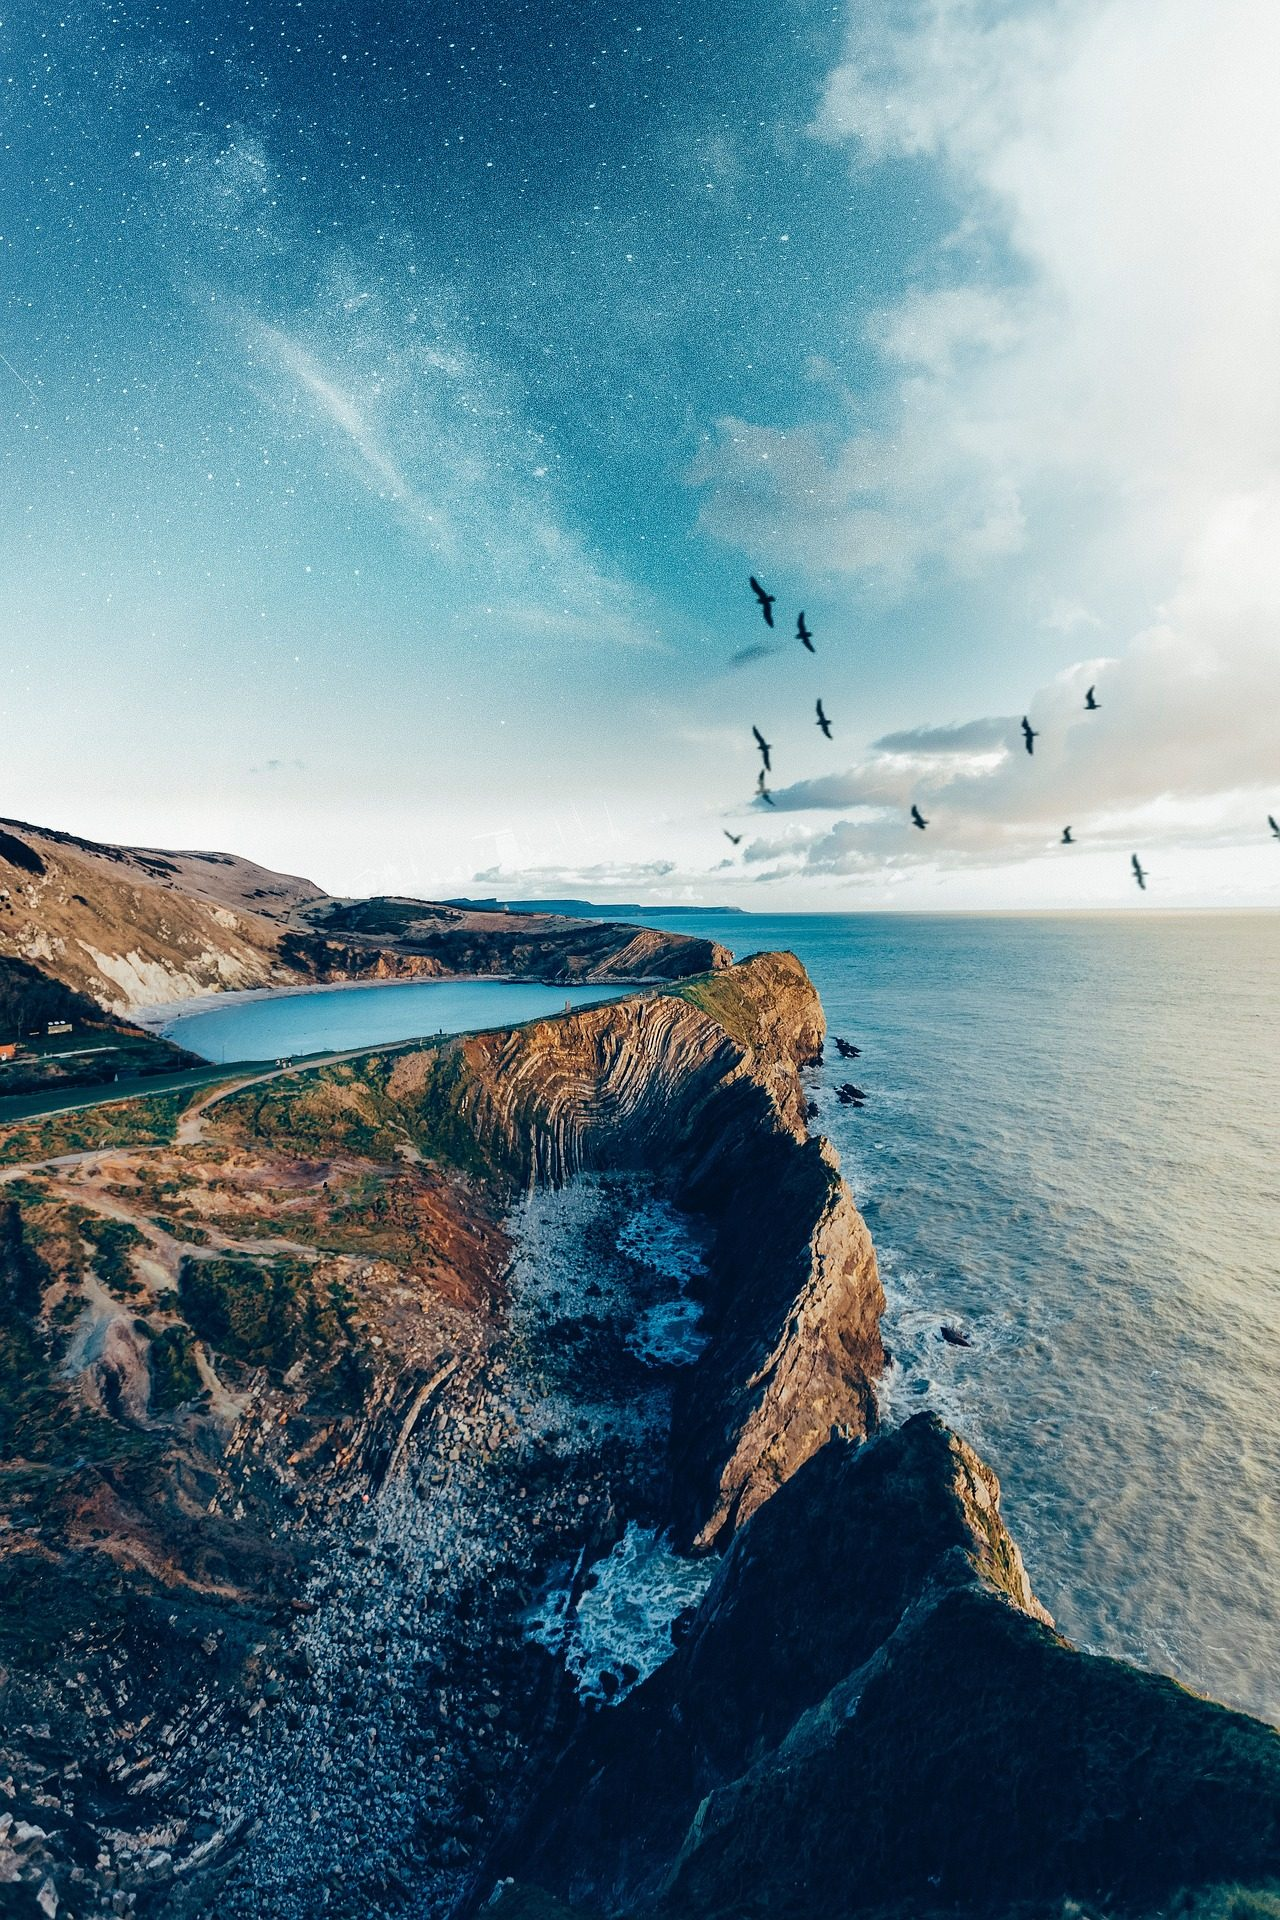 acantilado, camino, mar, océano, laguna, pájaros, cielo, nubes - Fondos de Pantalla HD - professor-falken.com